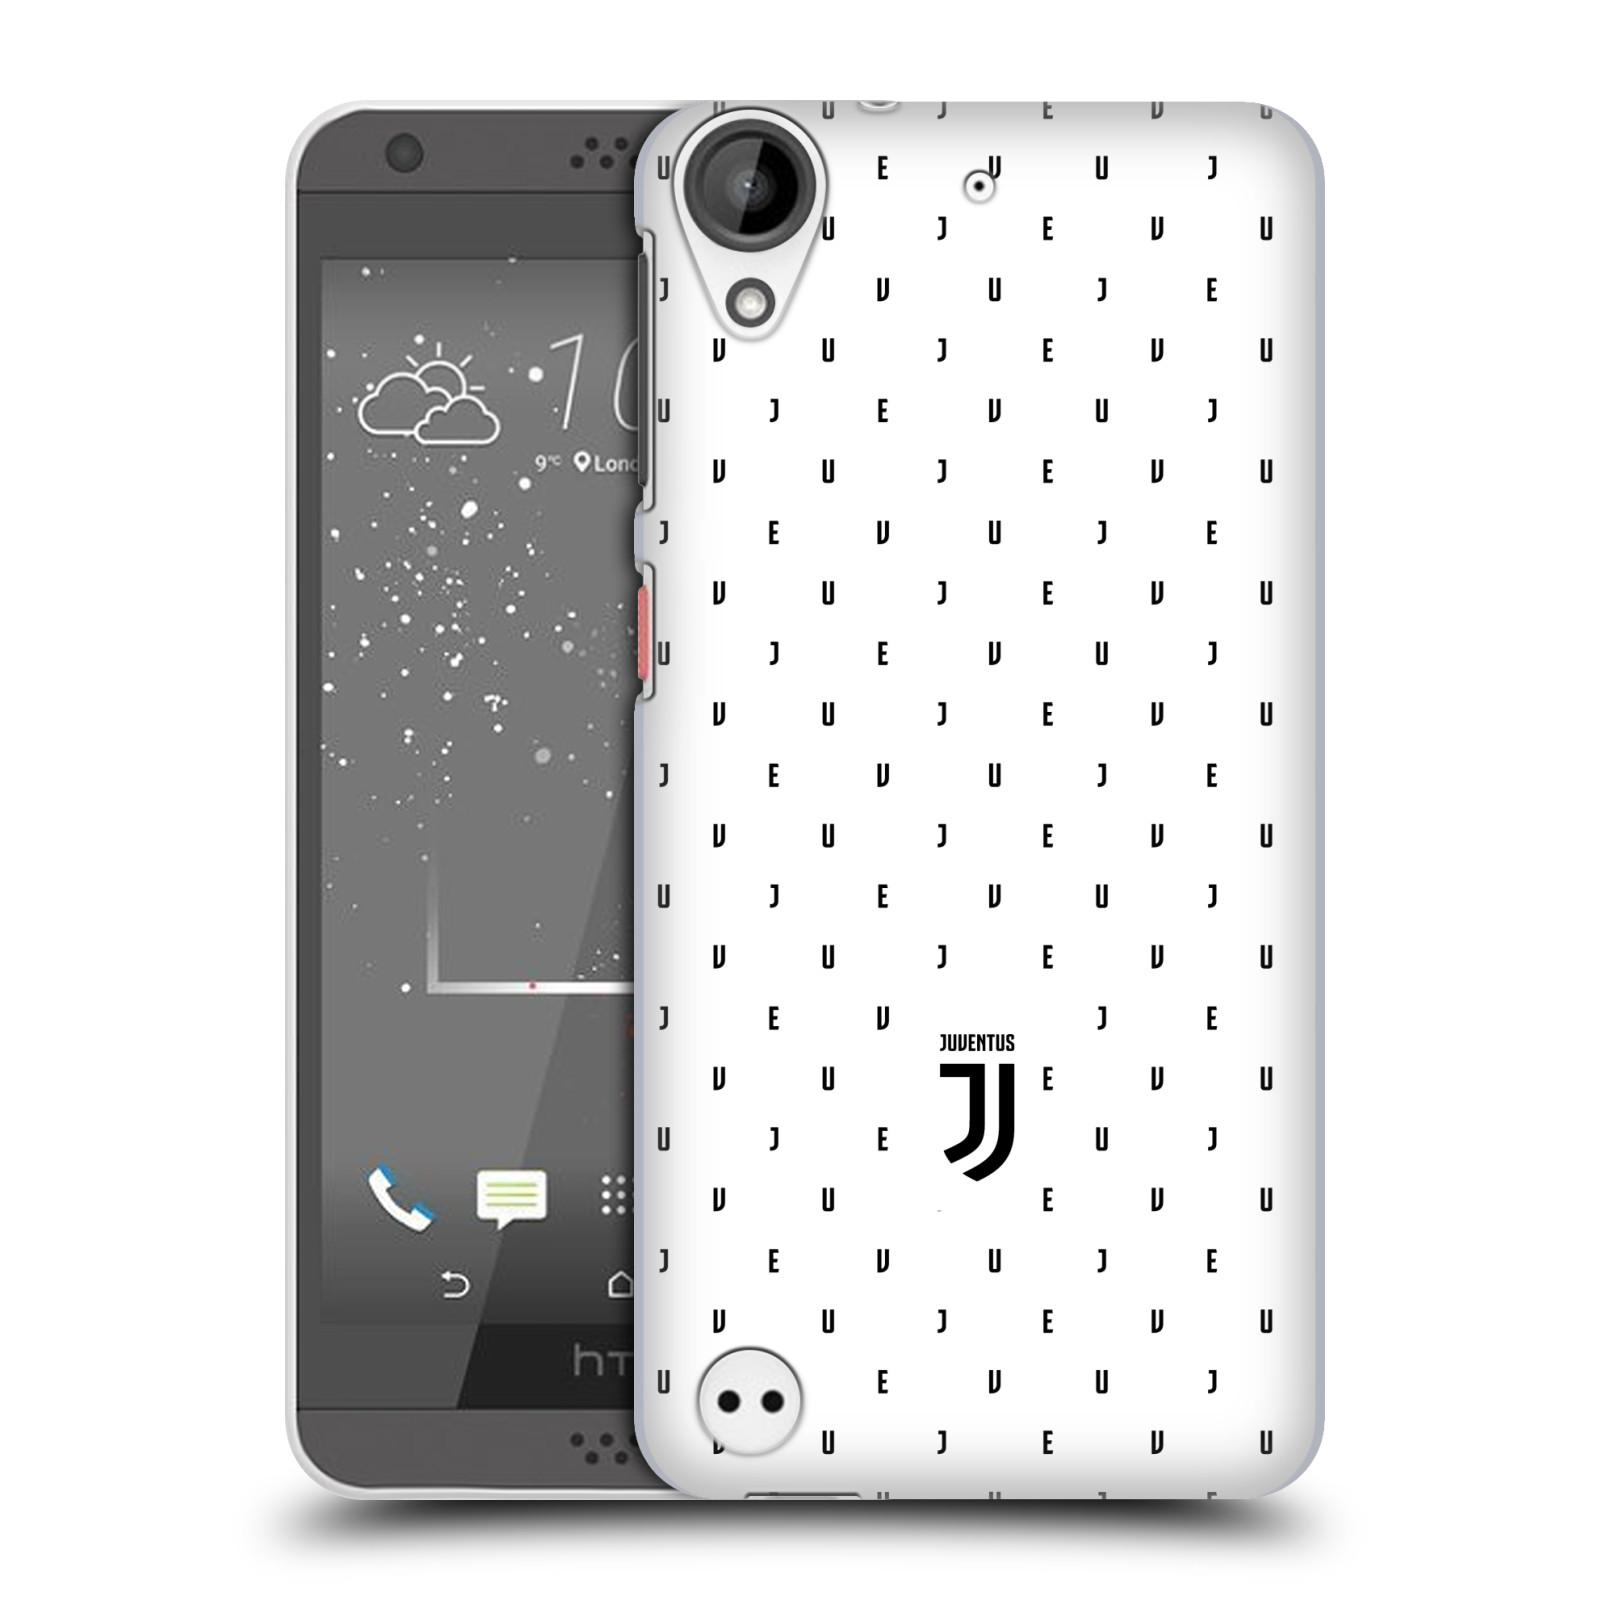 Plastové pouzdro na mobil HTC Desire 530 - Head Case - Juventus FC - Nové logo - Decentní